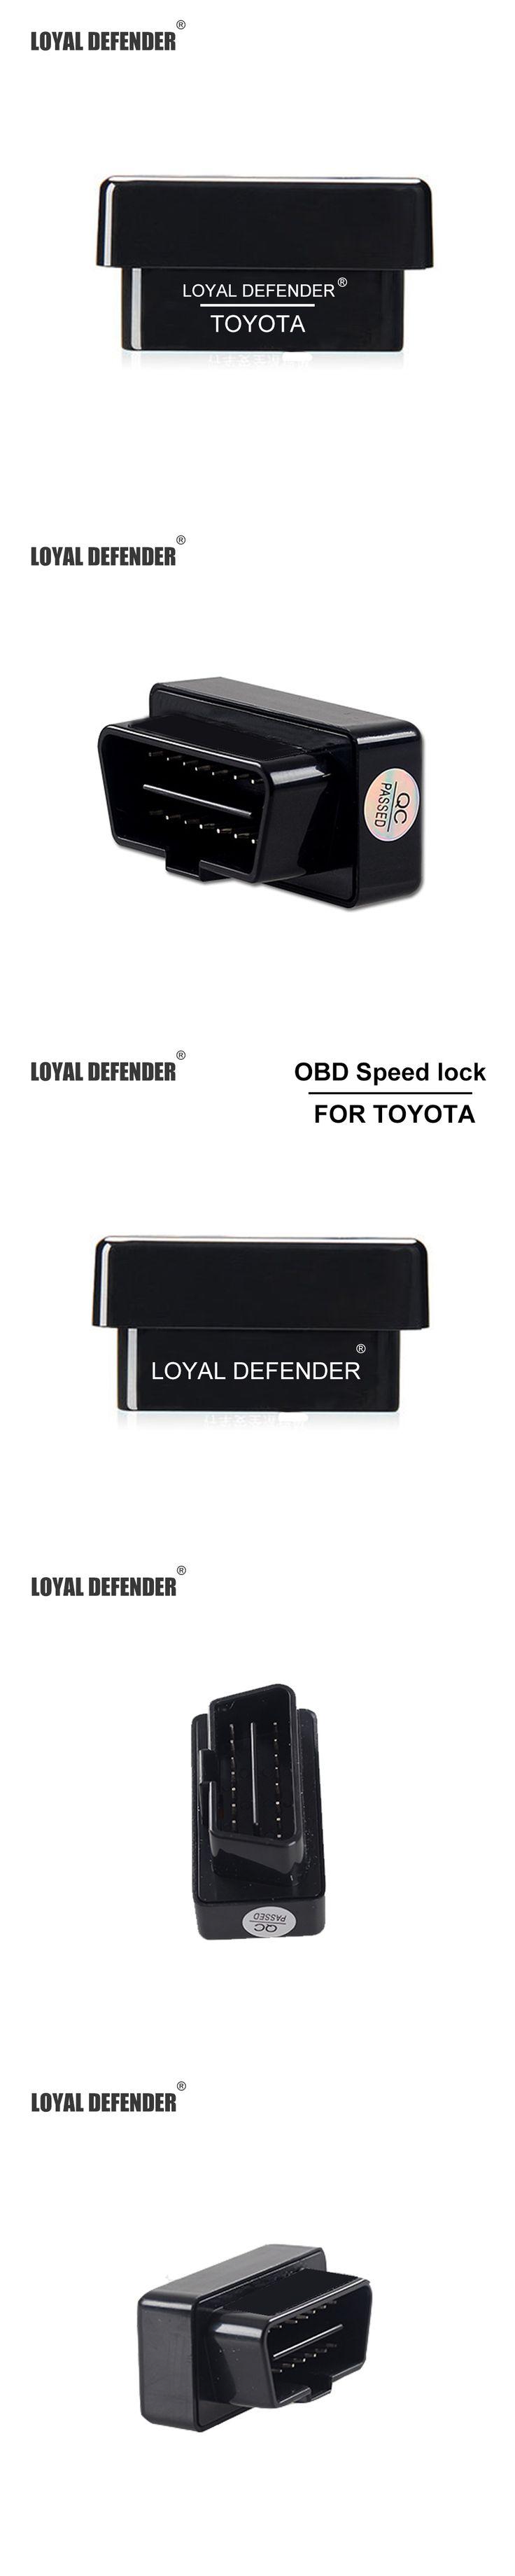 2016 New Smart Auto OBD Speed Lock Profession Produce Car OBD Door Lock Device for Camry/Corolla/Rav4/Prado car auto OBD lock